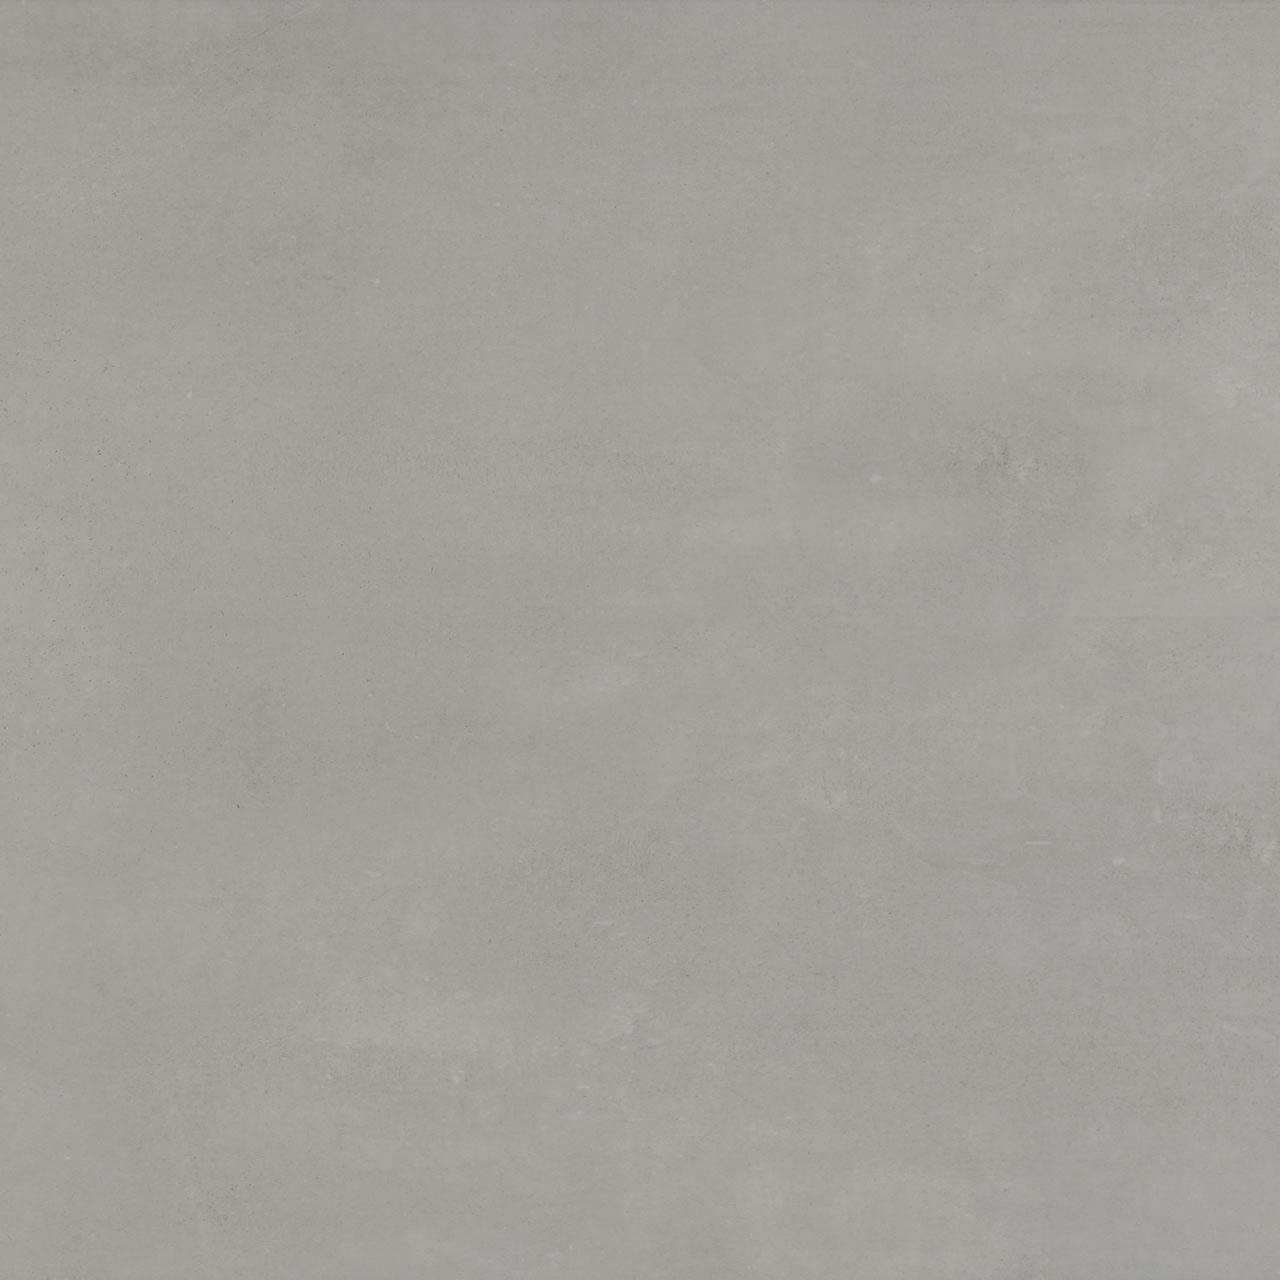 Cemento yuna limpia V AC 90×90